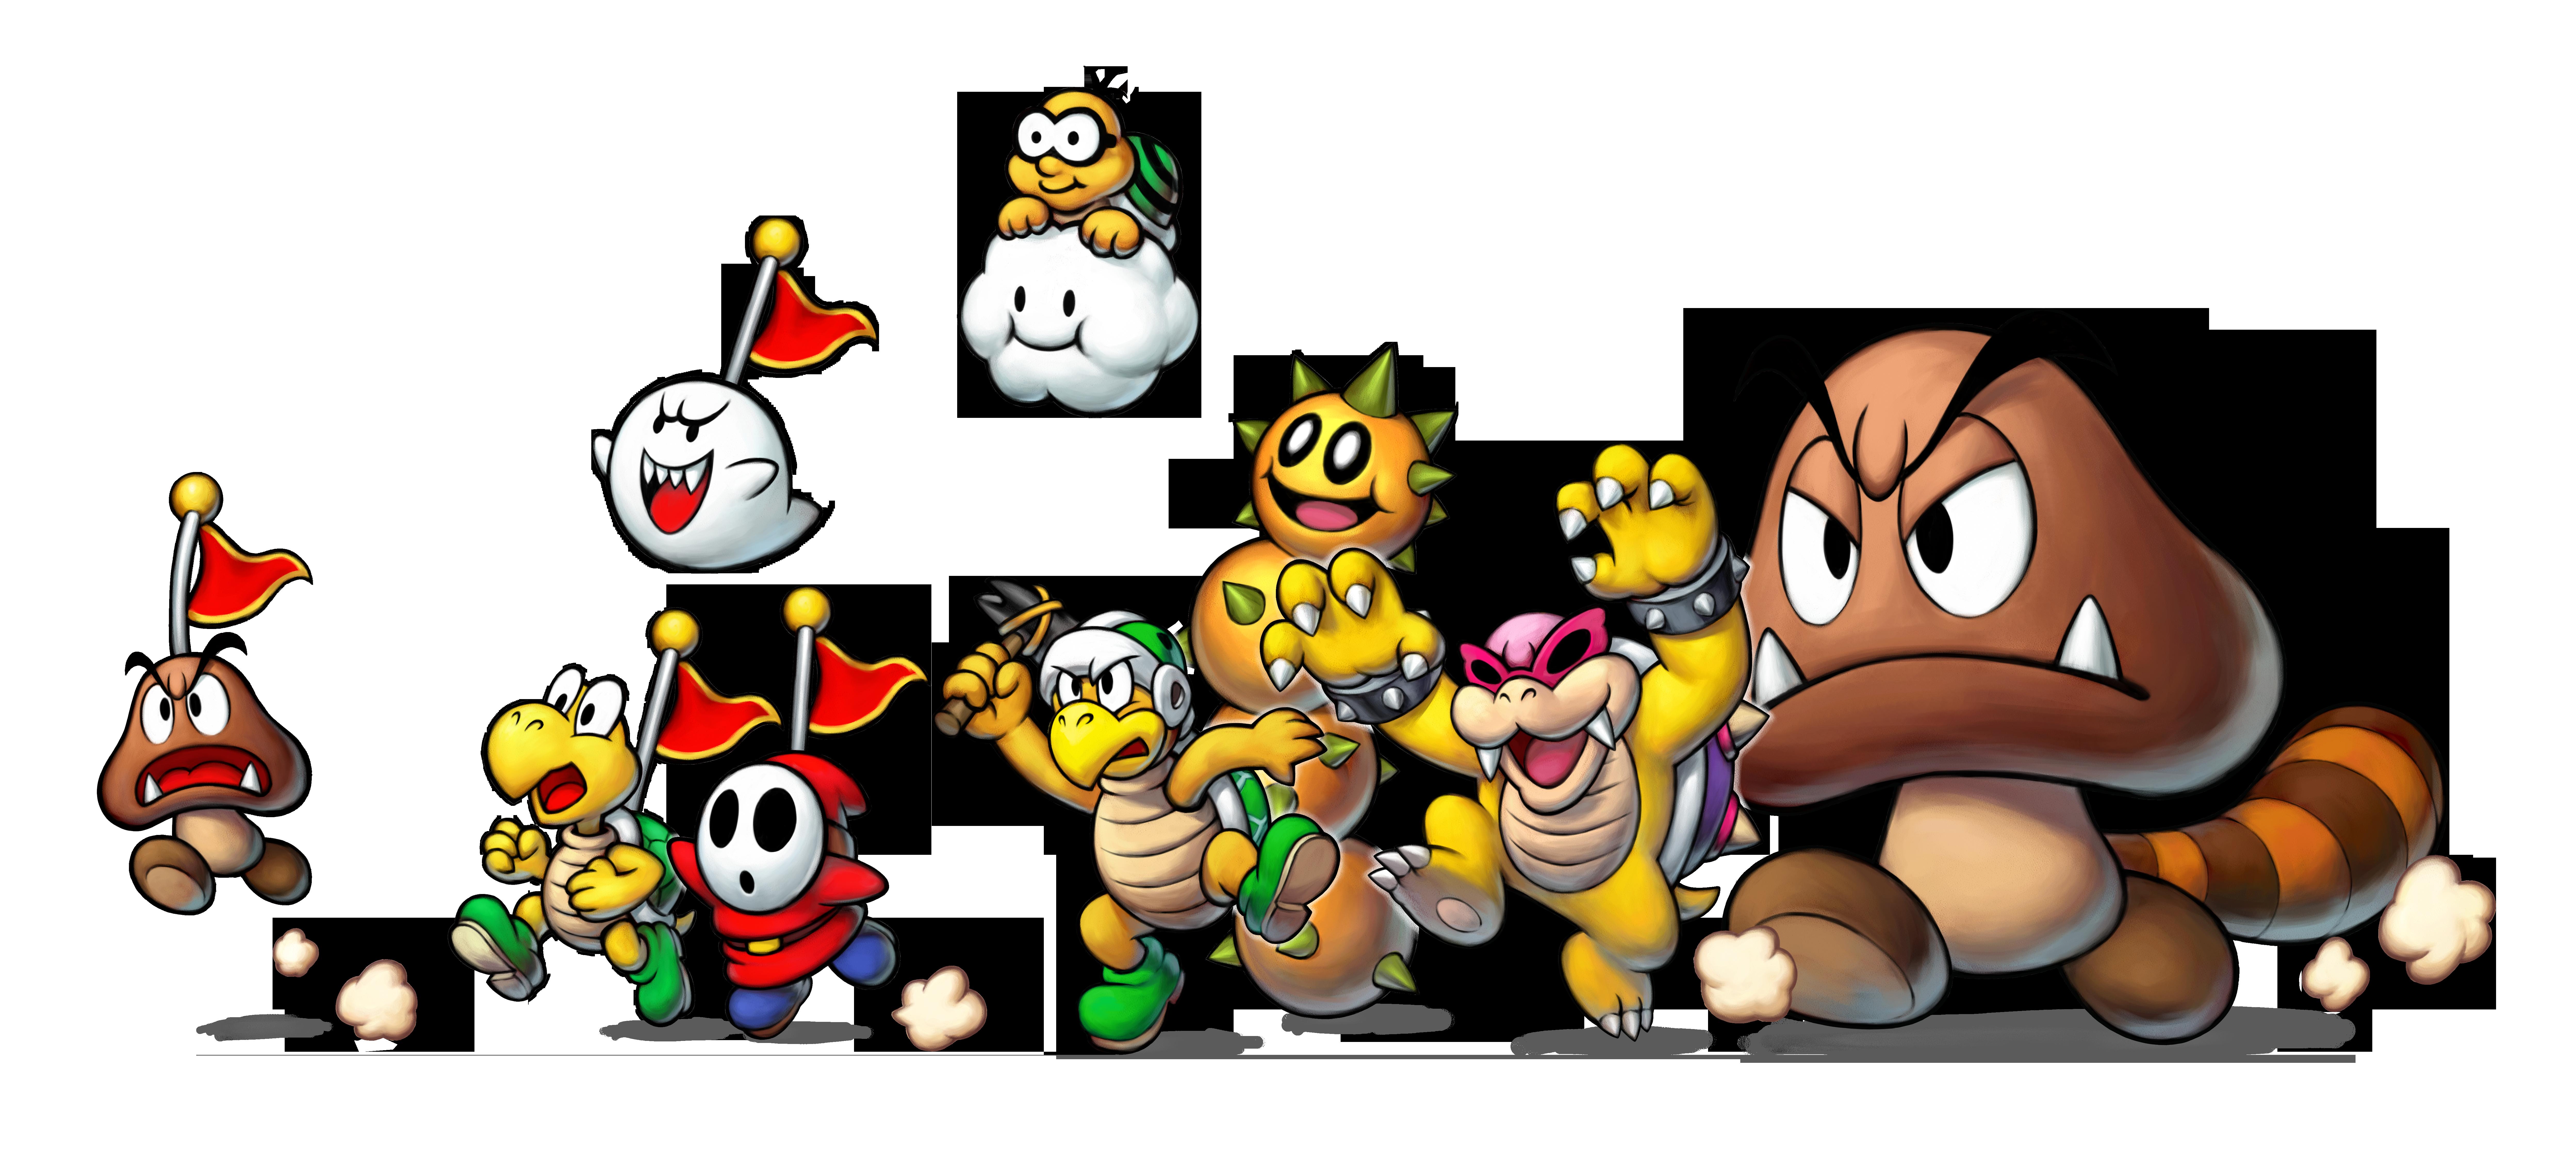 Mario and Luigi Superstar Saga plus Bowser's Minions